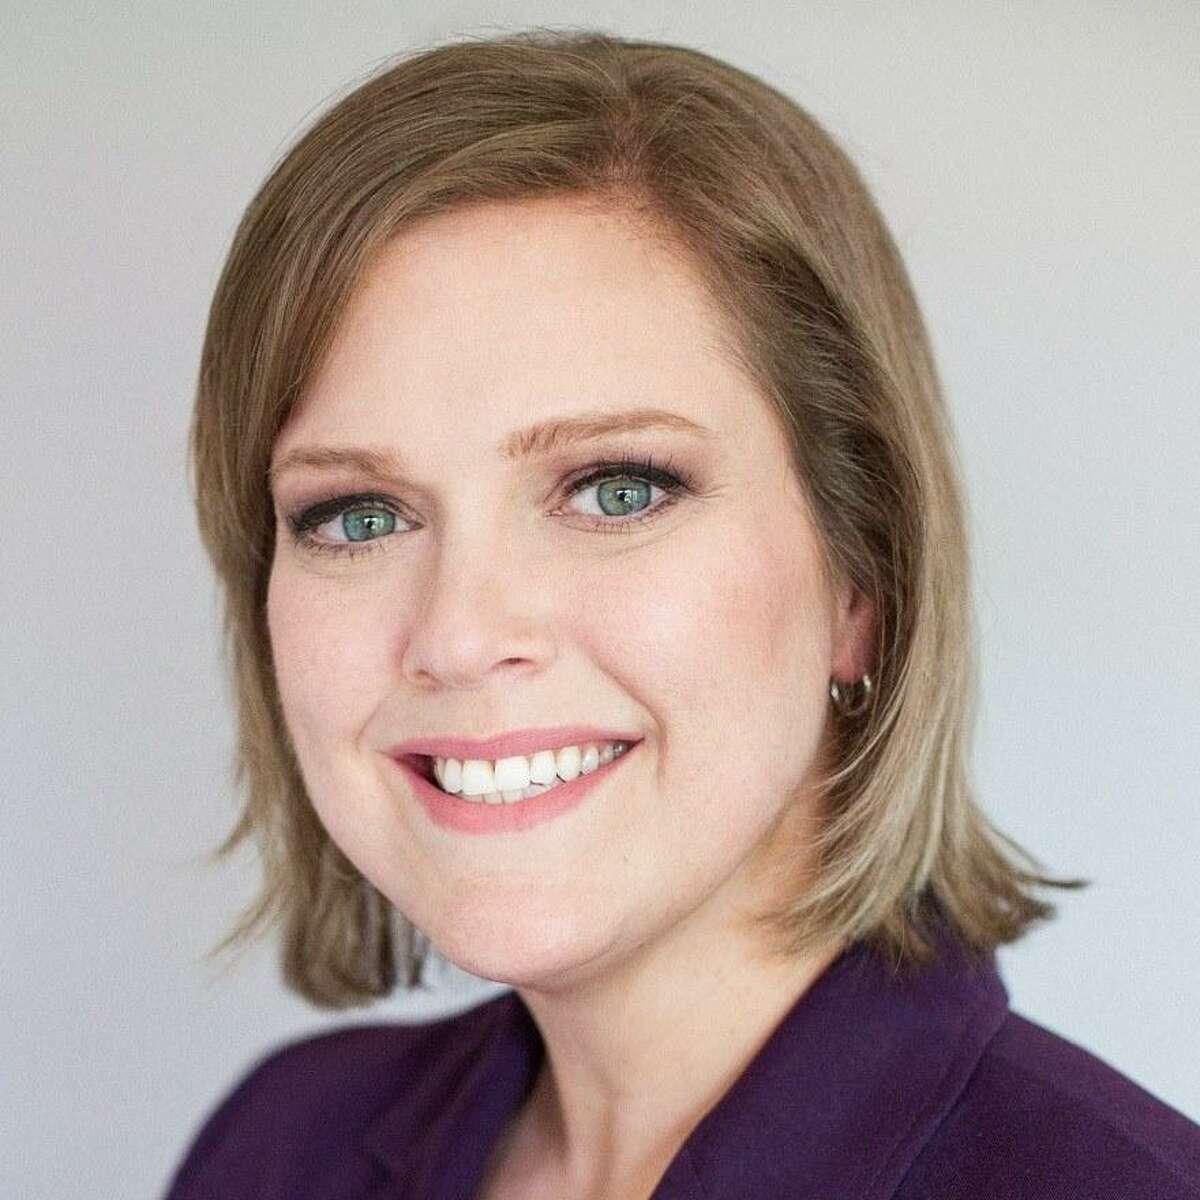 State District Criminal Court 263rdJudicial candidate Amy Martin